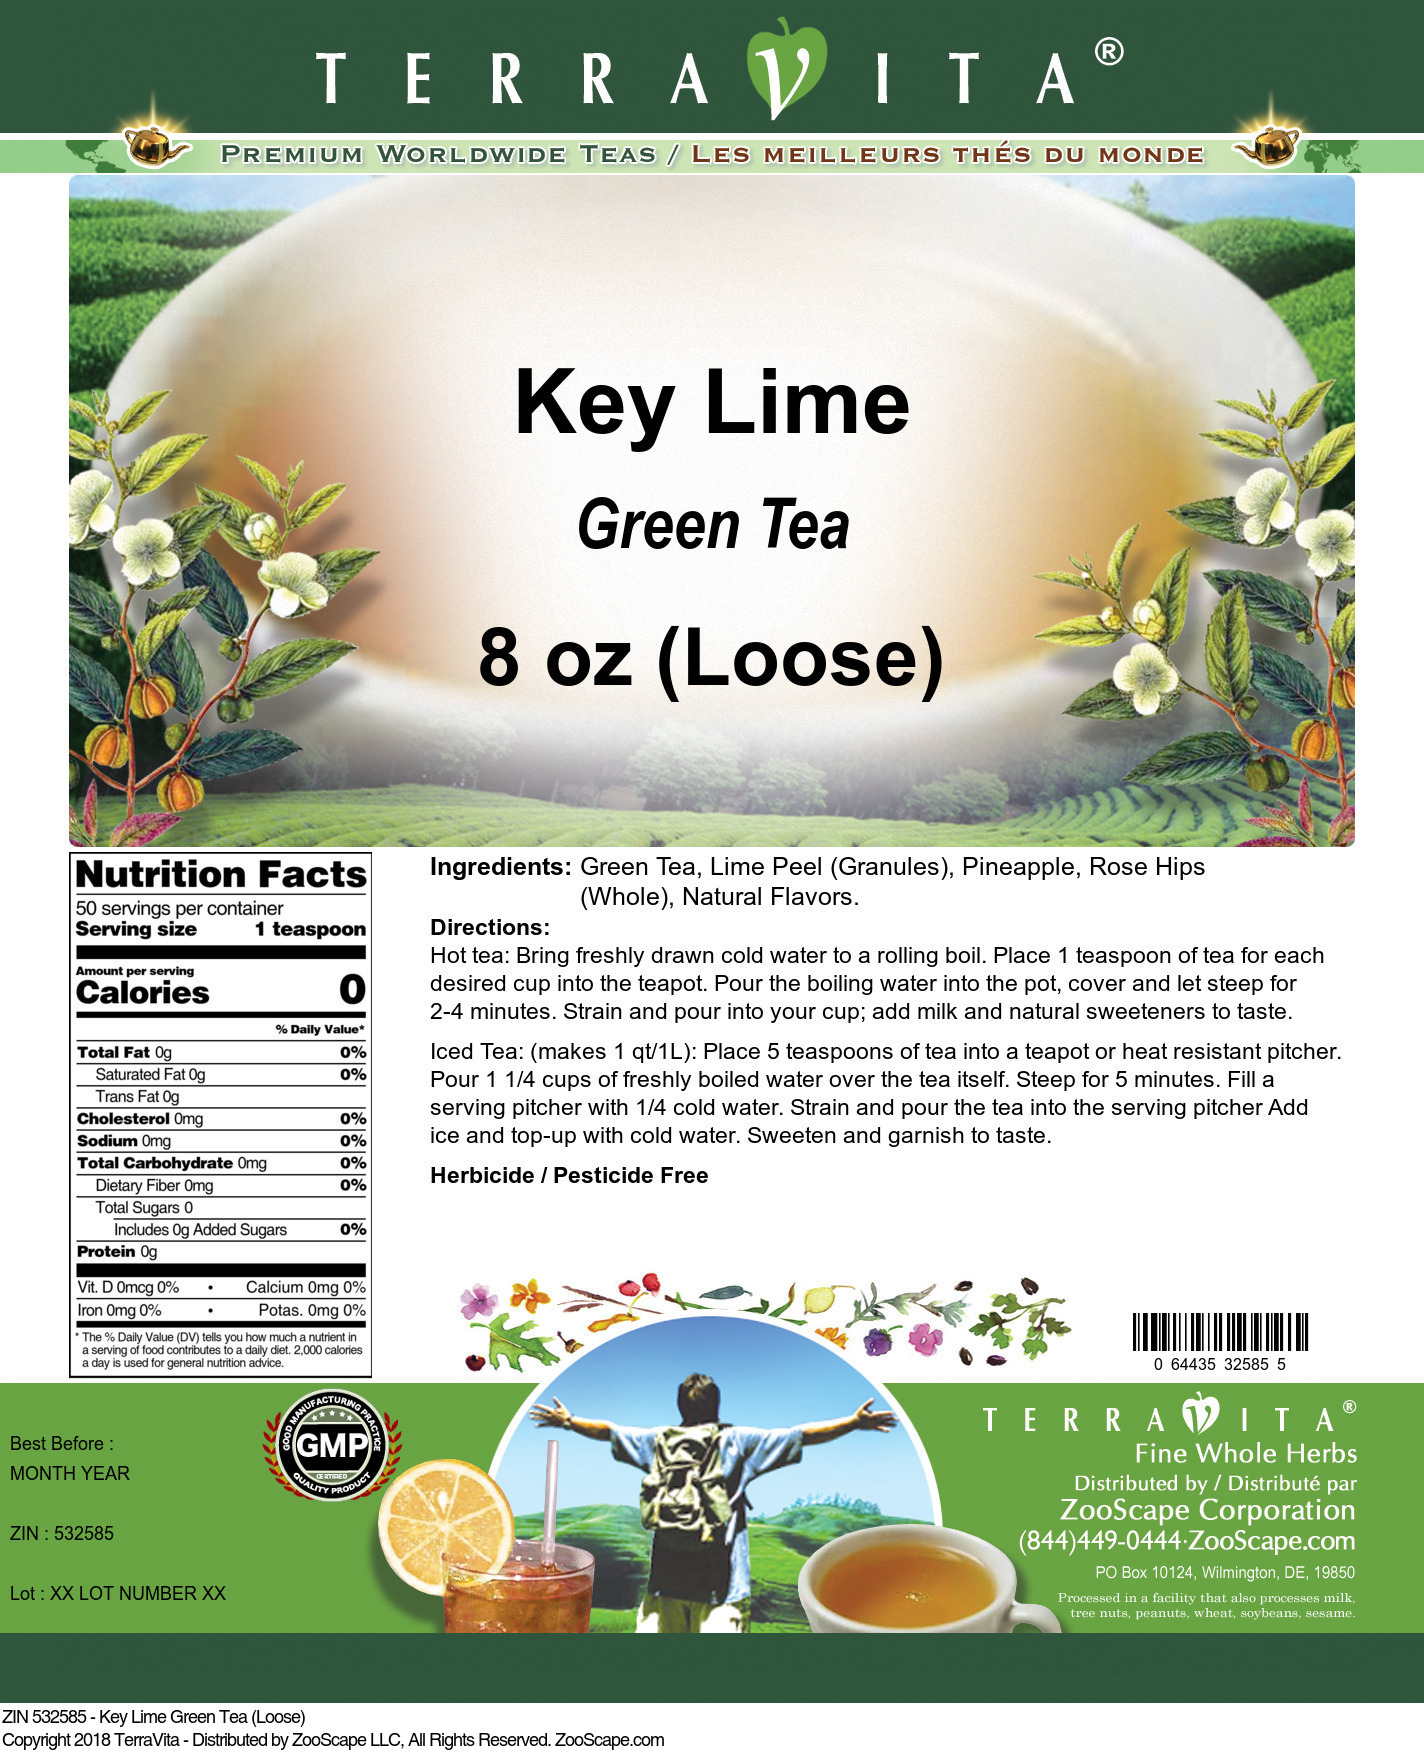 Key Lime Green Tea